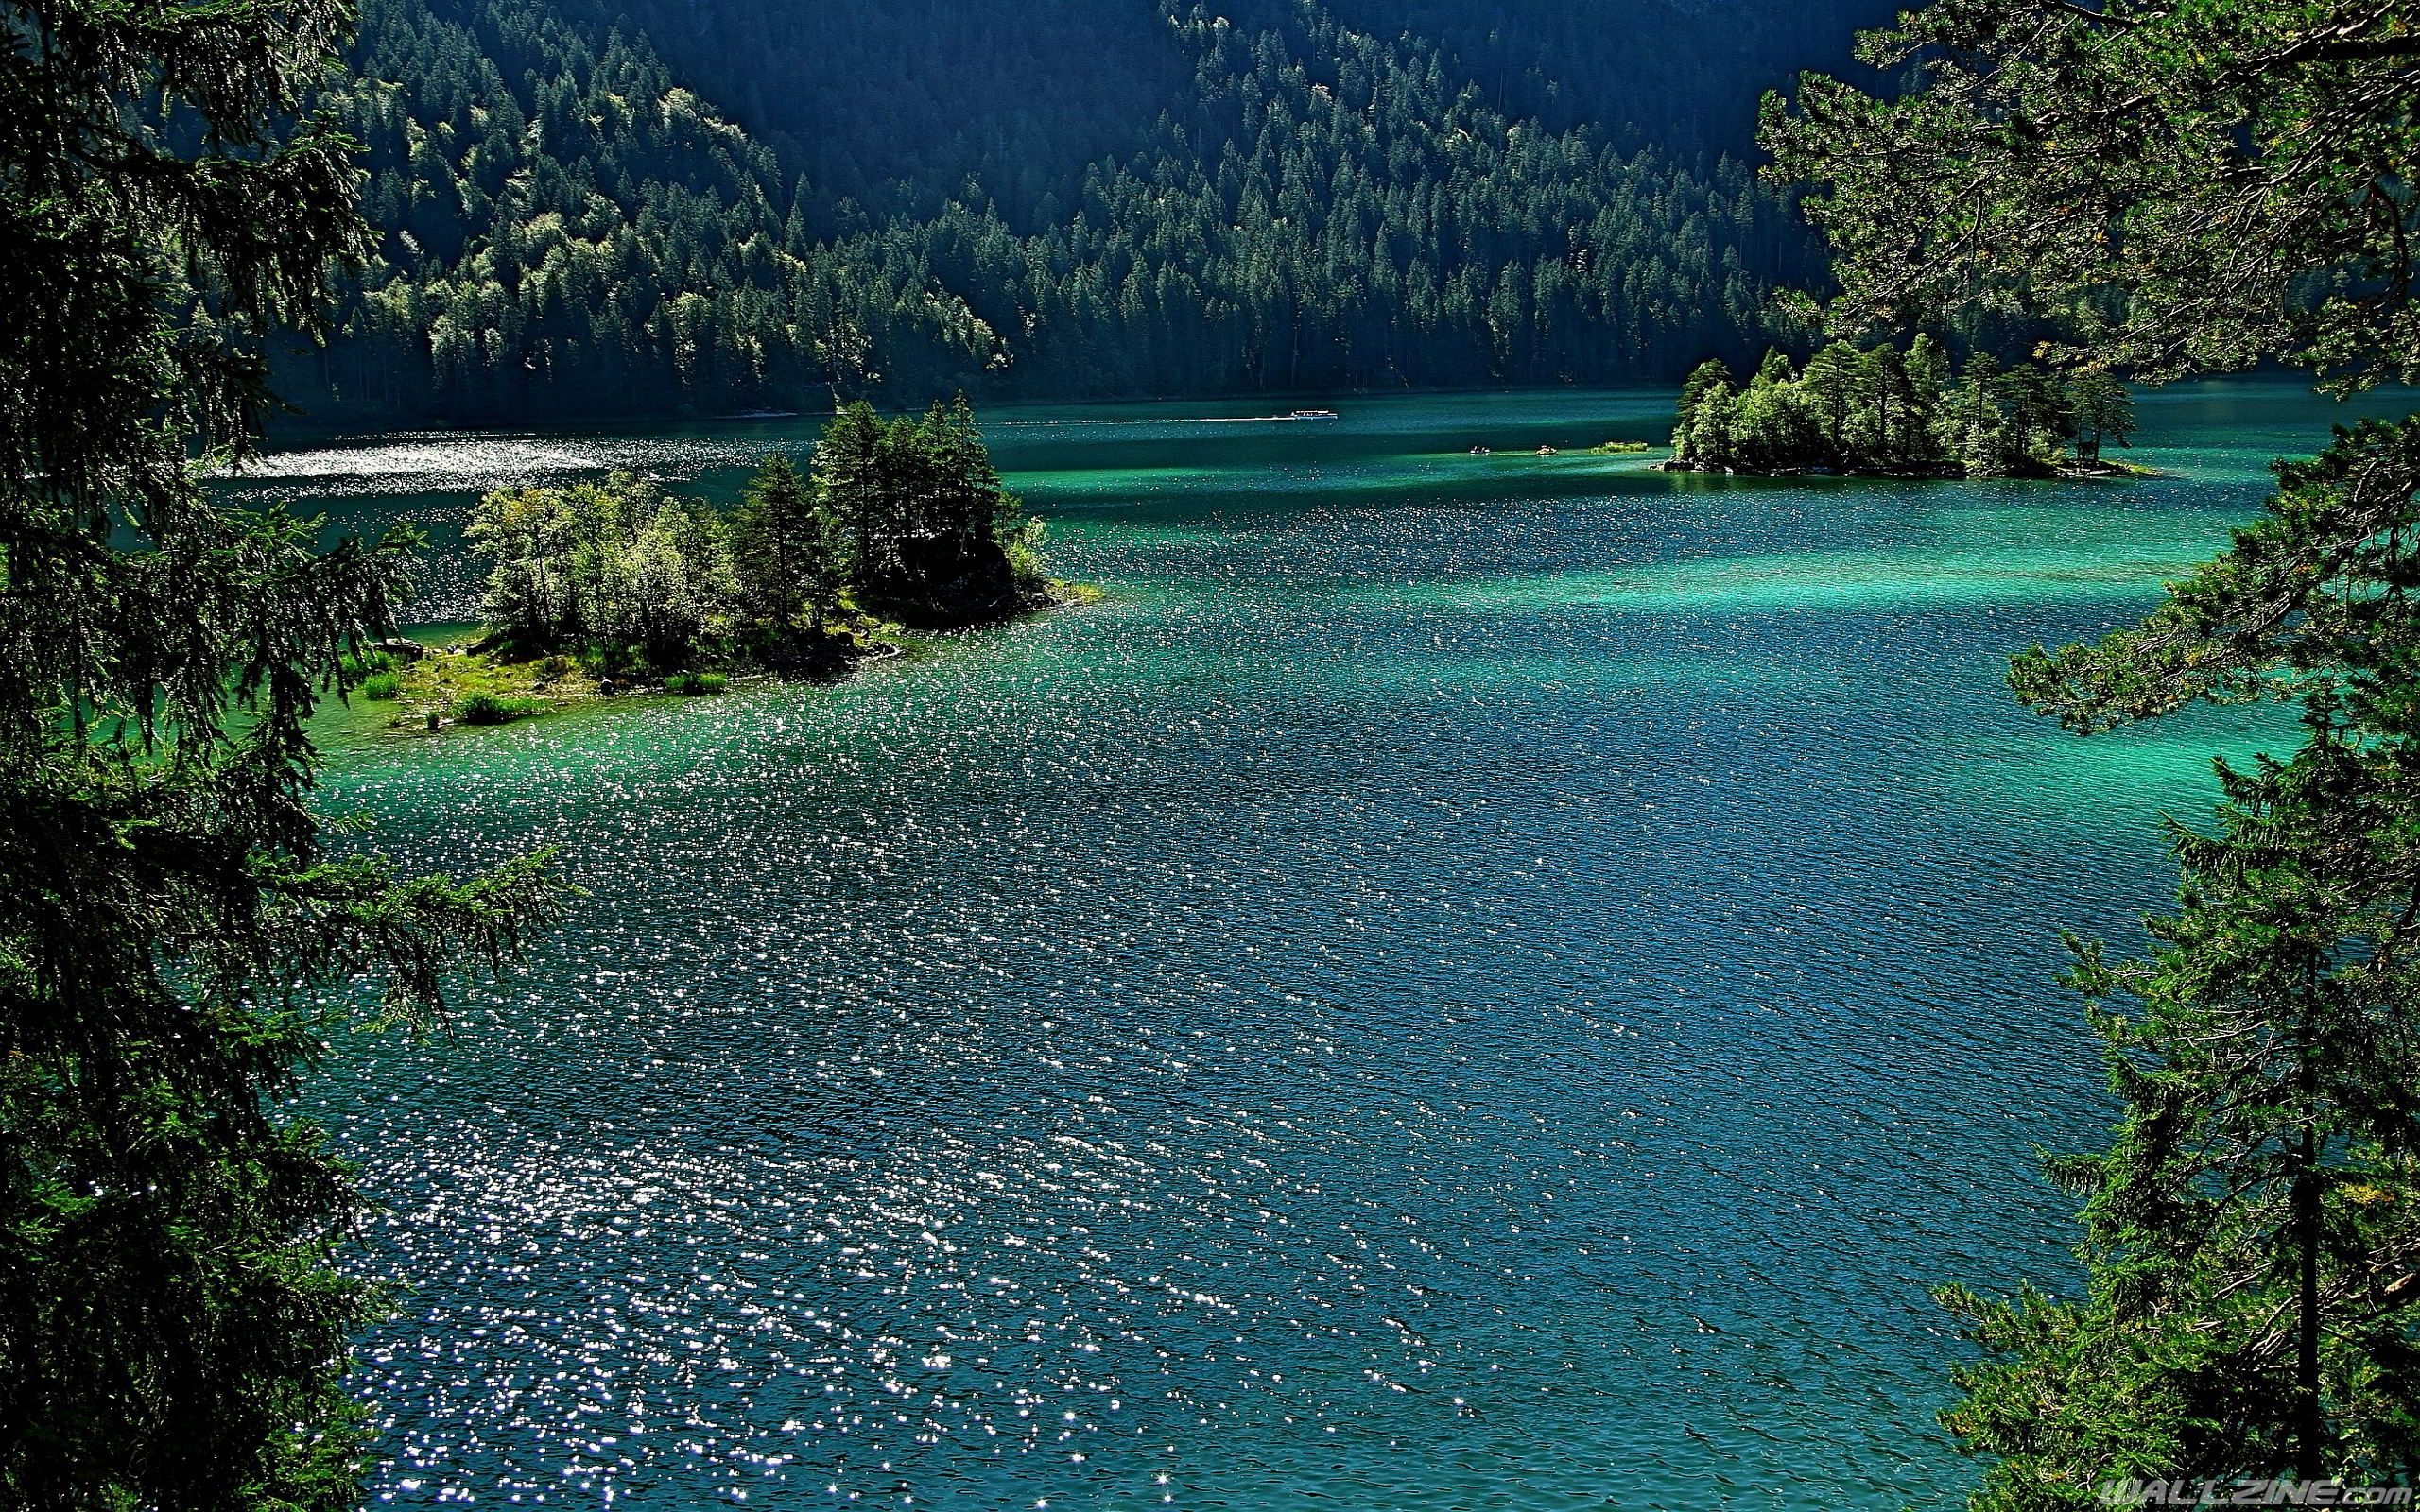 Lake Bavaria Grainau Hd Desktop Wallpaper Wallzine Com Eibsee Deutschland Dahoam Is Dahoam